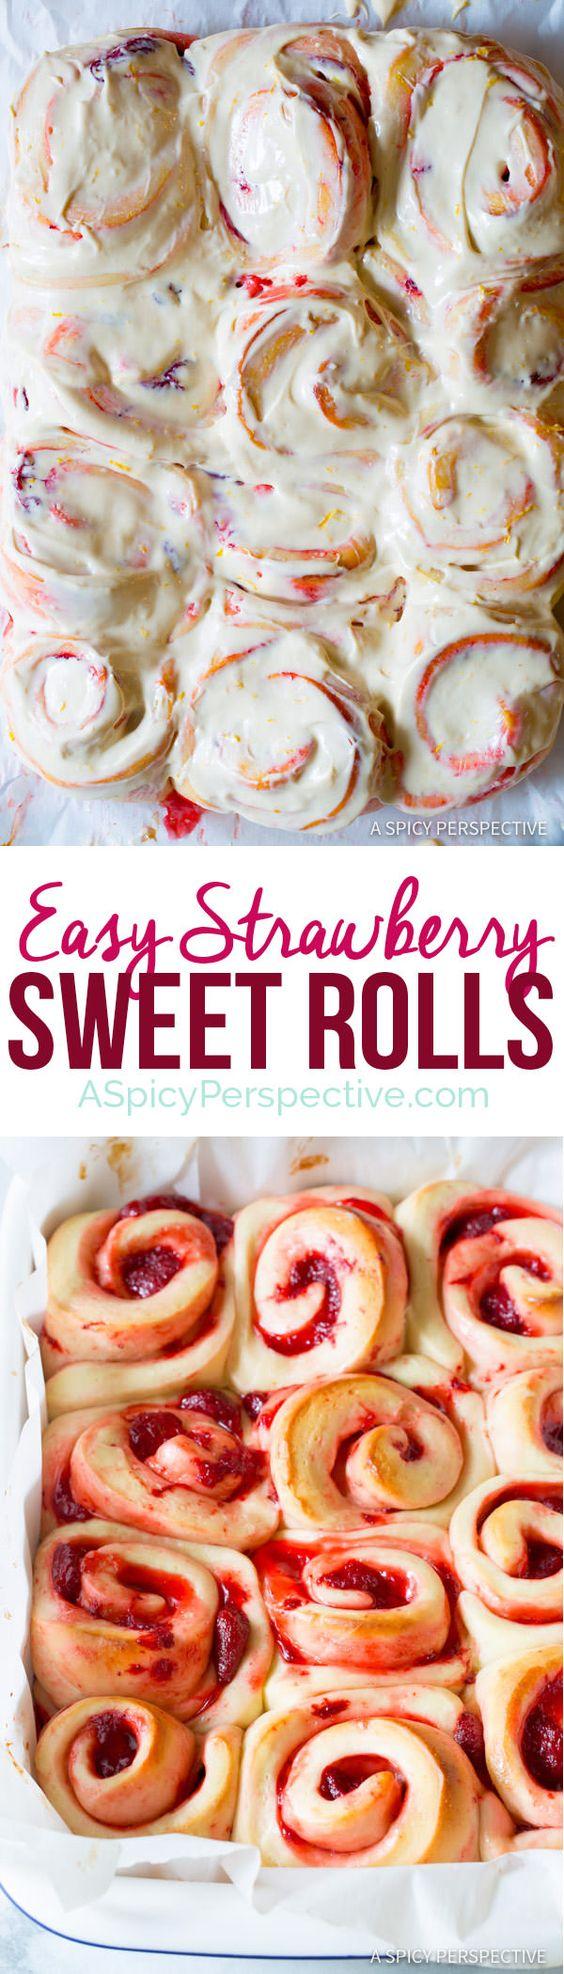 The Best Strawberry Sweet Rolls Recipe   ASpicyPerspective.com